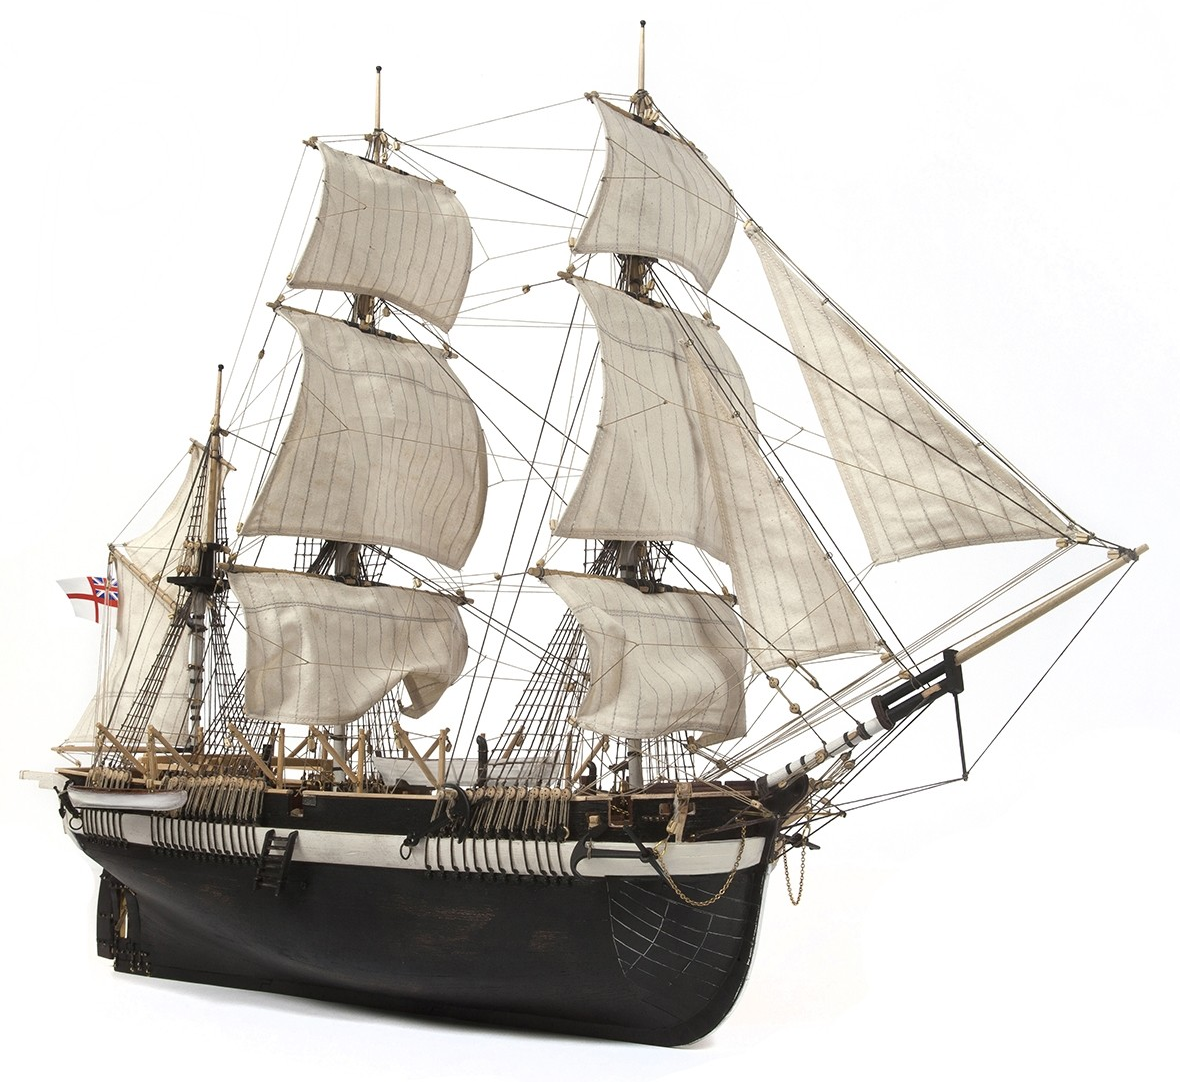 Occre HMS Terror Wooden Model Ship Kit 12004 | Occre Boat Kits | Hobbies